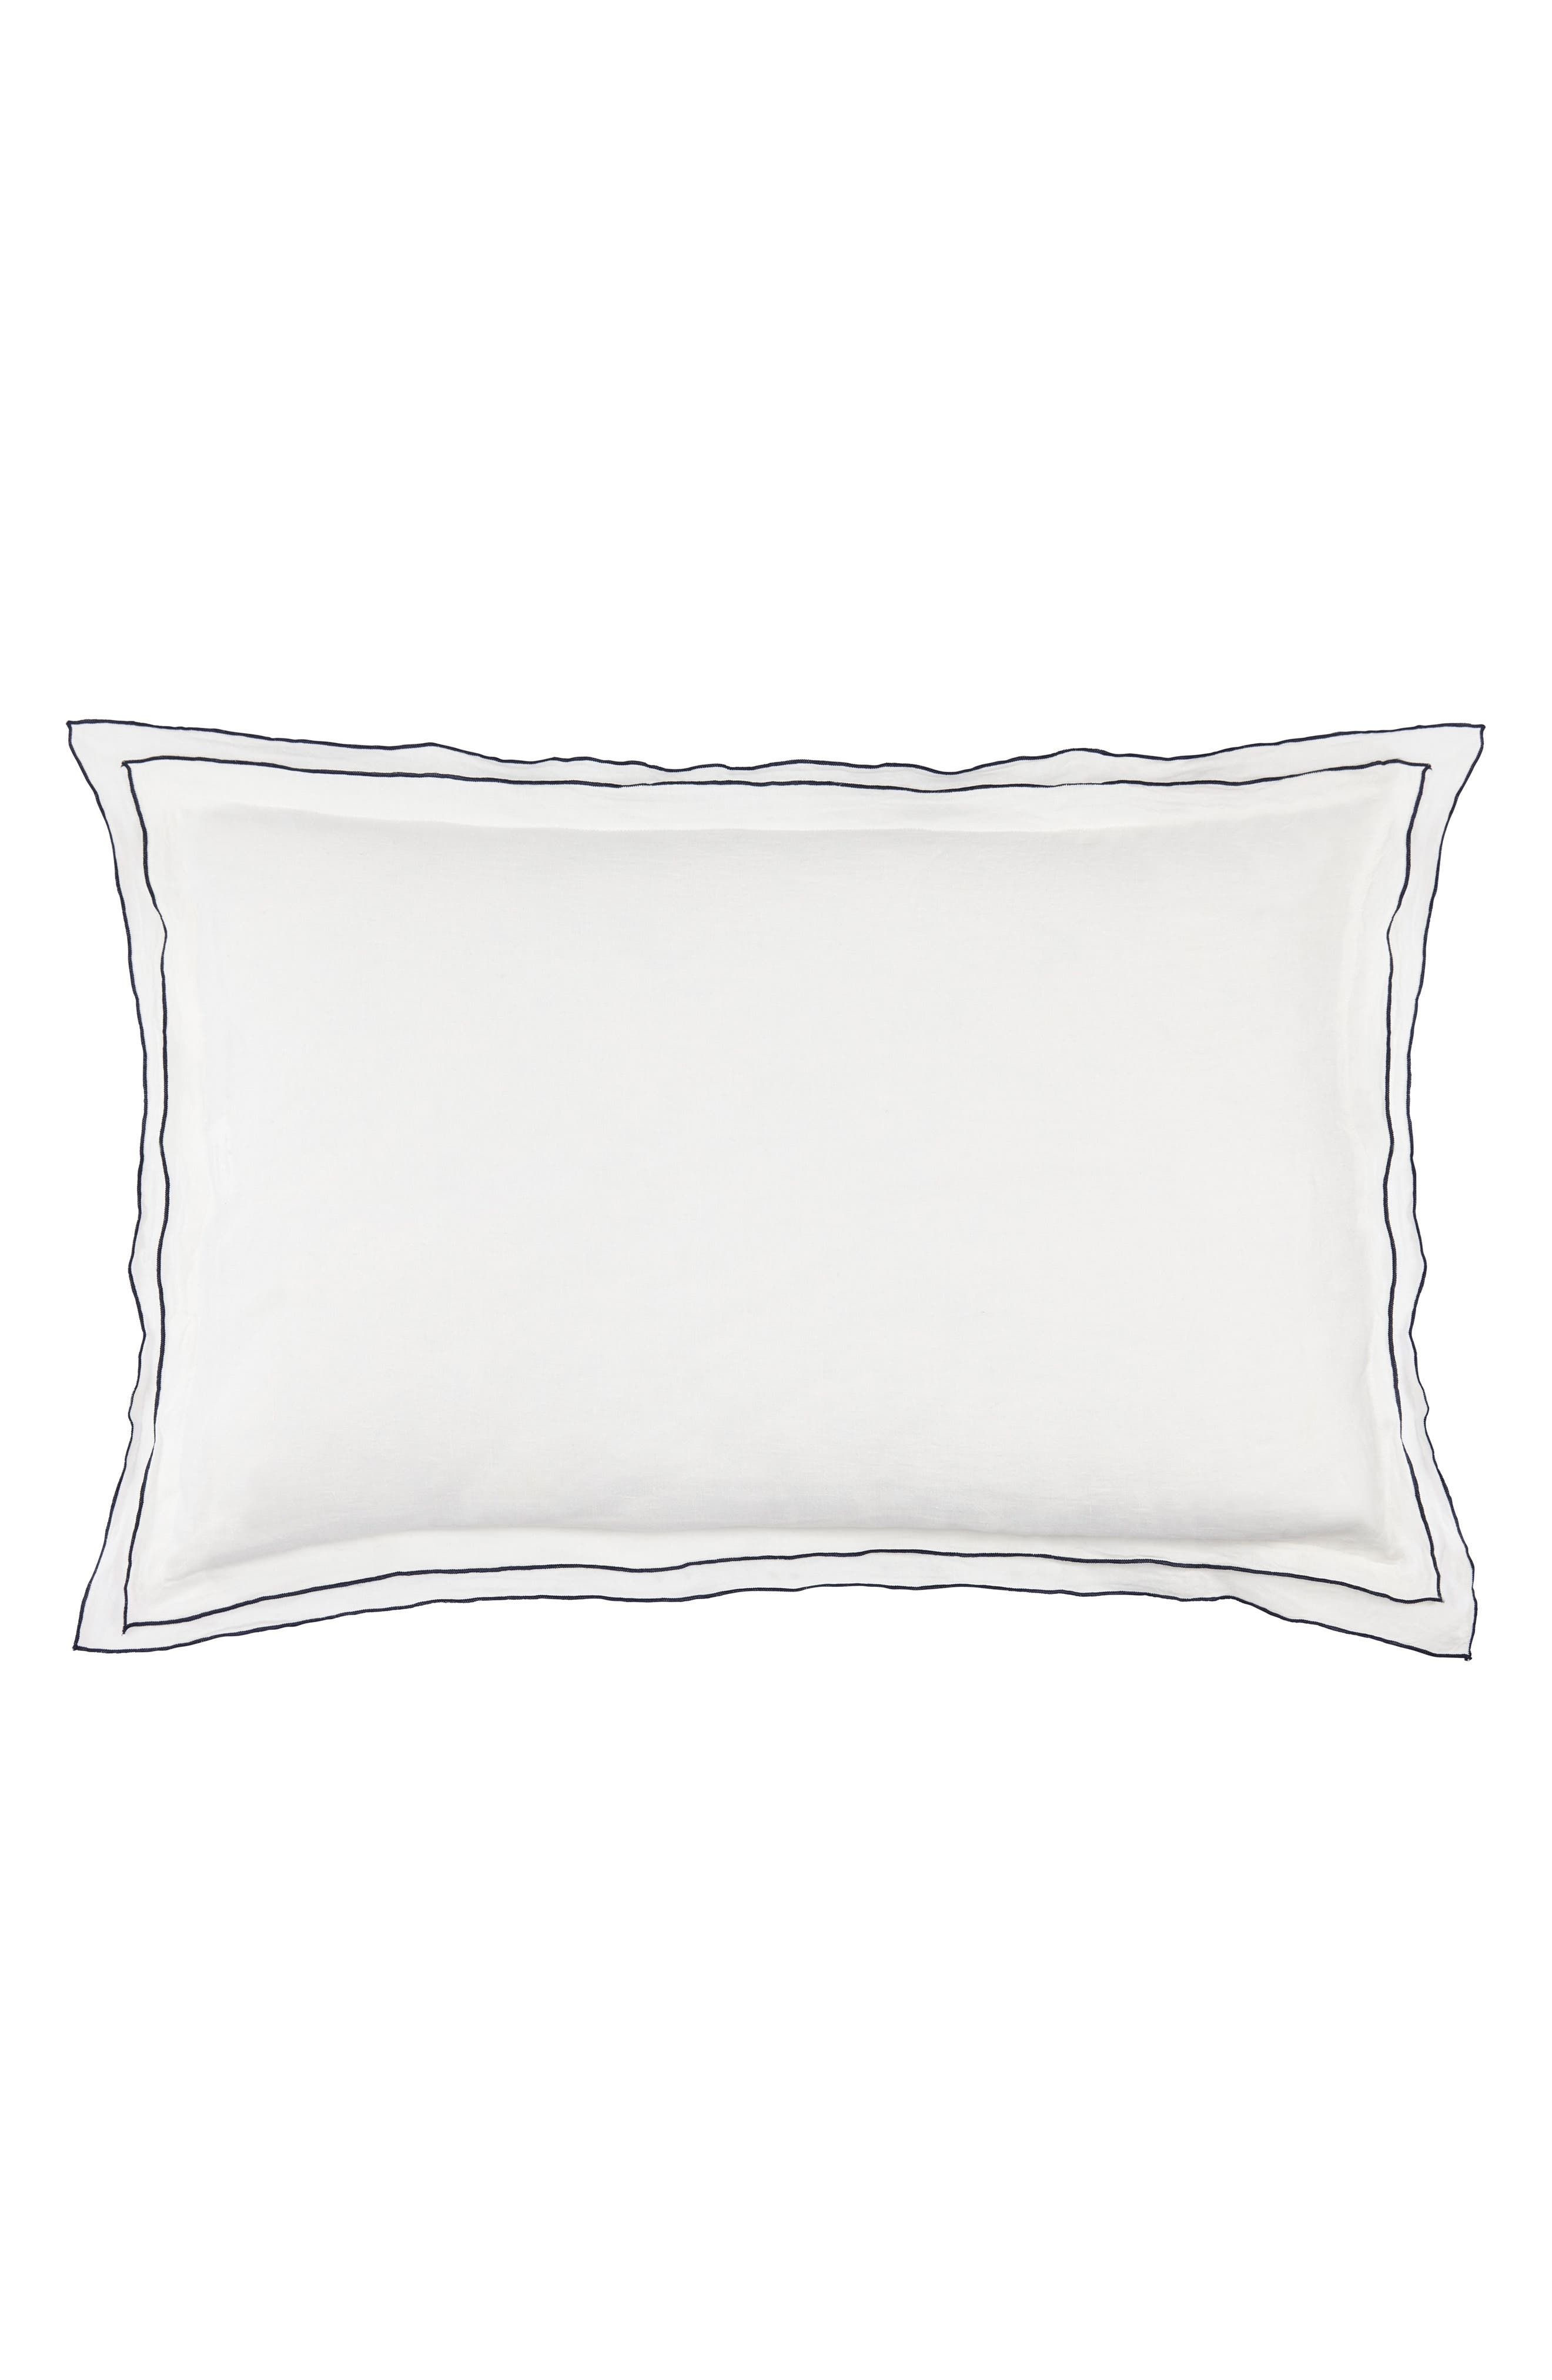 Biarritz Linen Sham,                         Main,                         color, White/ Indigo